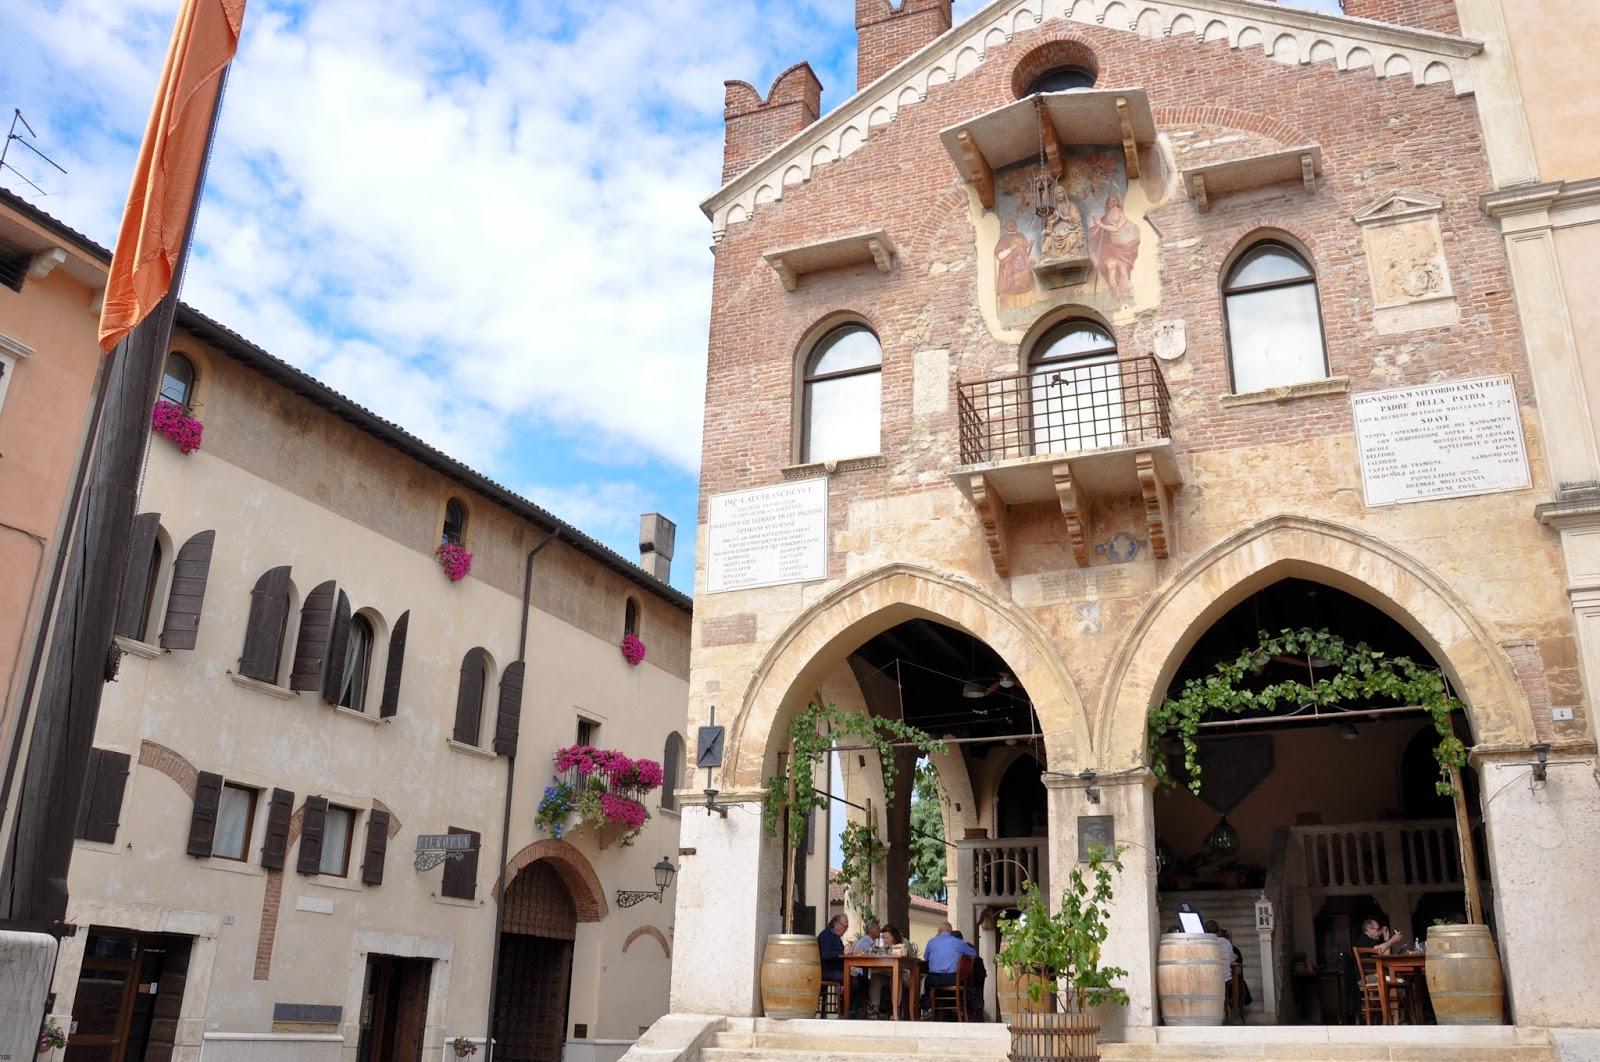 A picturesque restaurant, Soave, Veneto, Italy